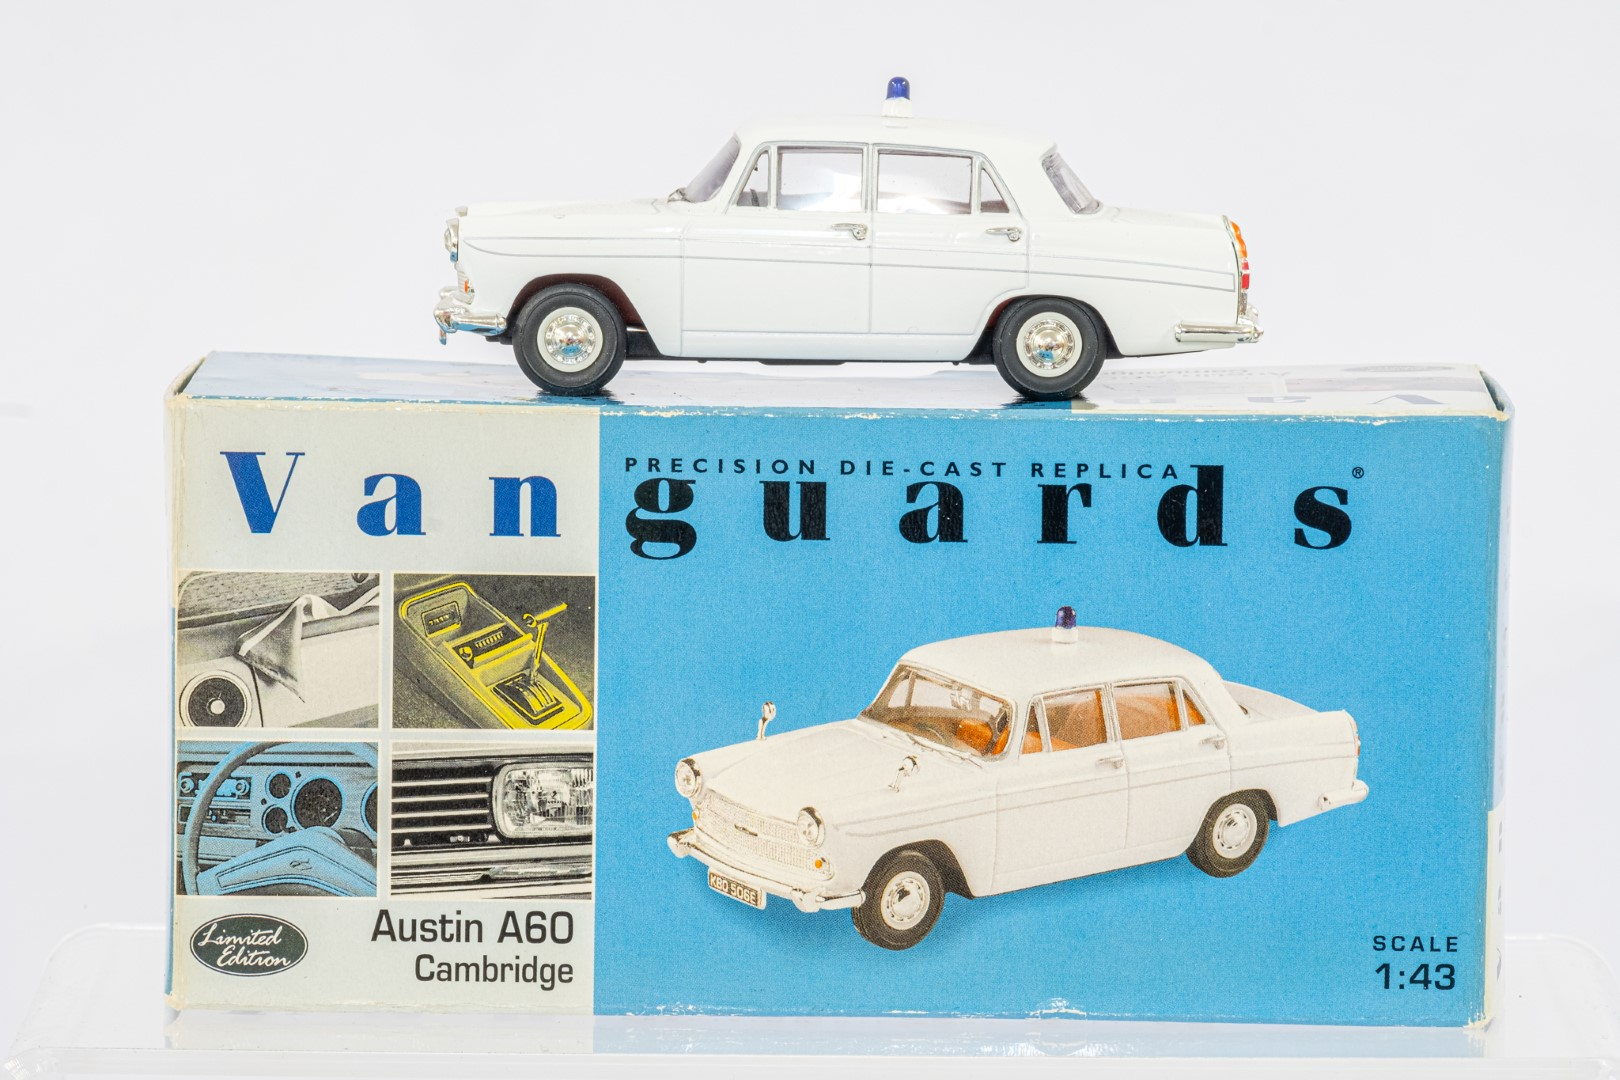 Vanguards 2 Boxed Car Models - Austin A60 Cambridge & Ford Zephyr - - Image 2 of 3